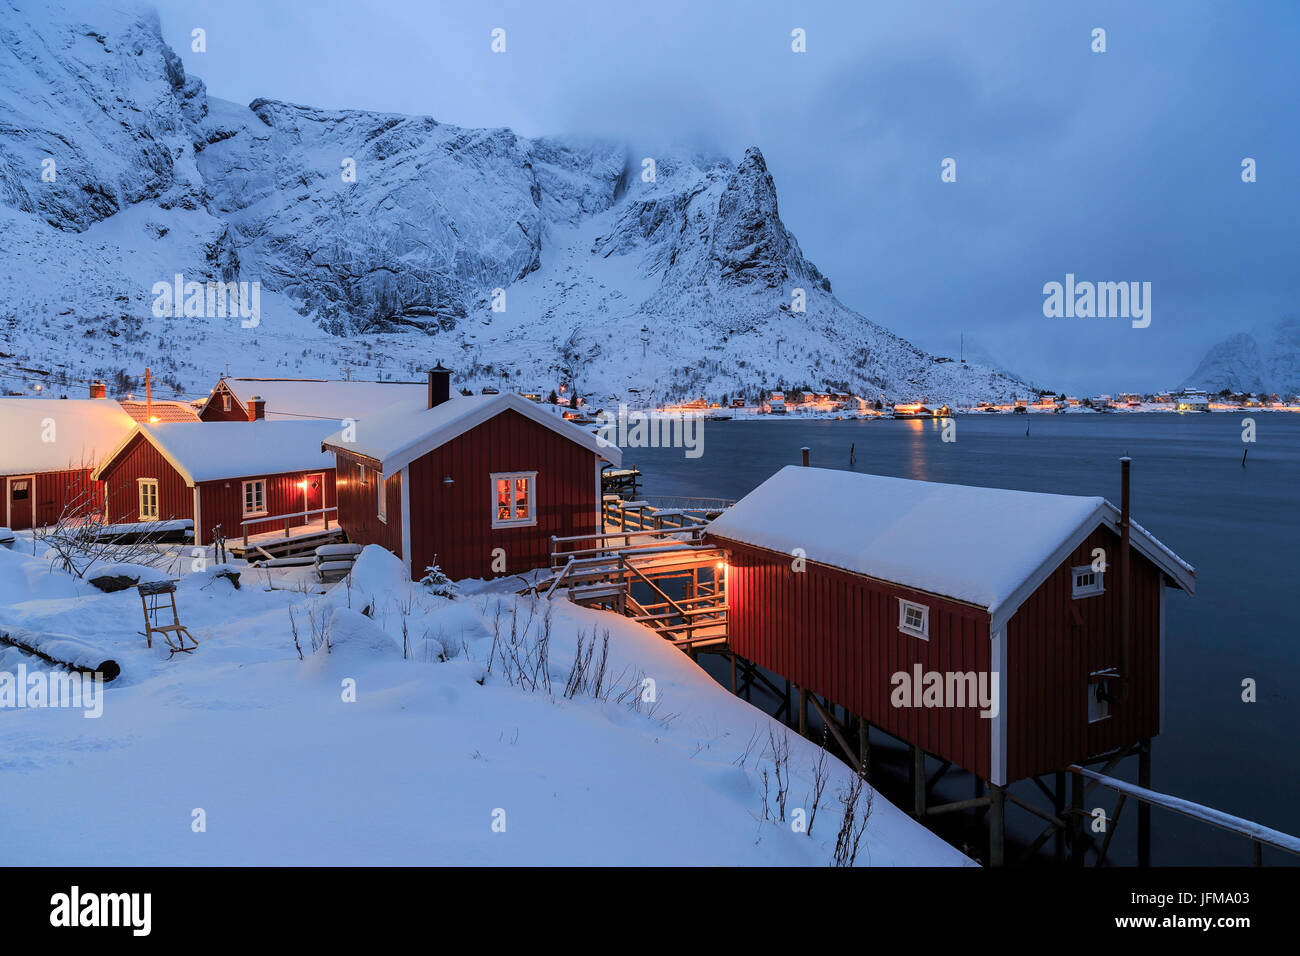 Typical fisherman Homes on the fishing bay of Reine fishing village, Lofoten islands, norway - Stock Image